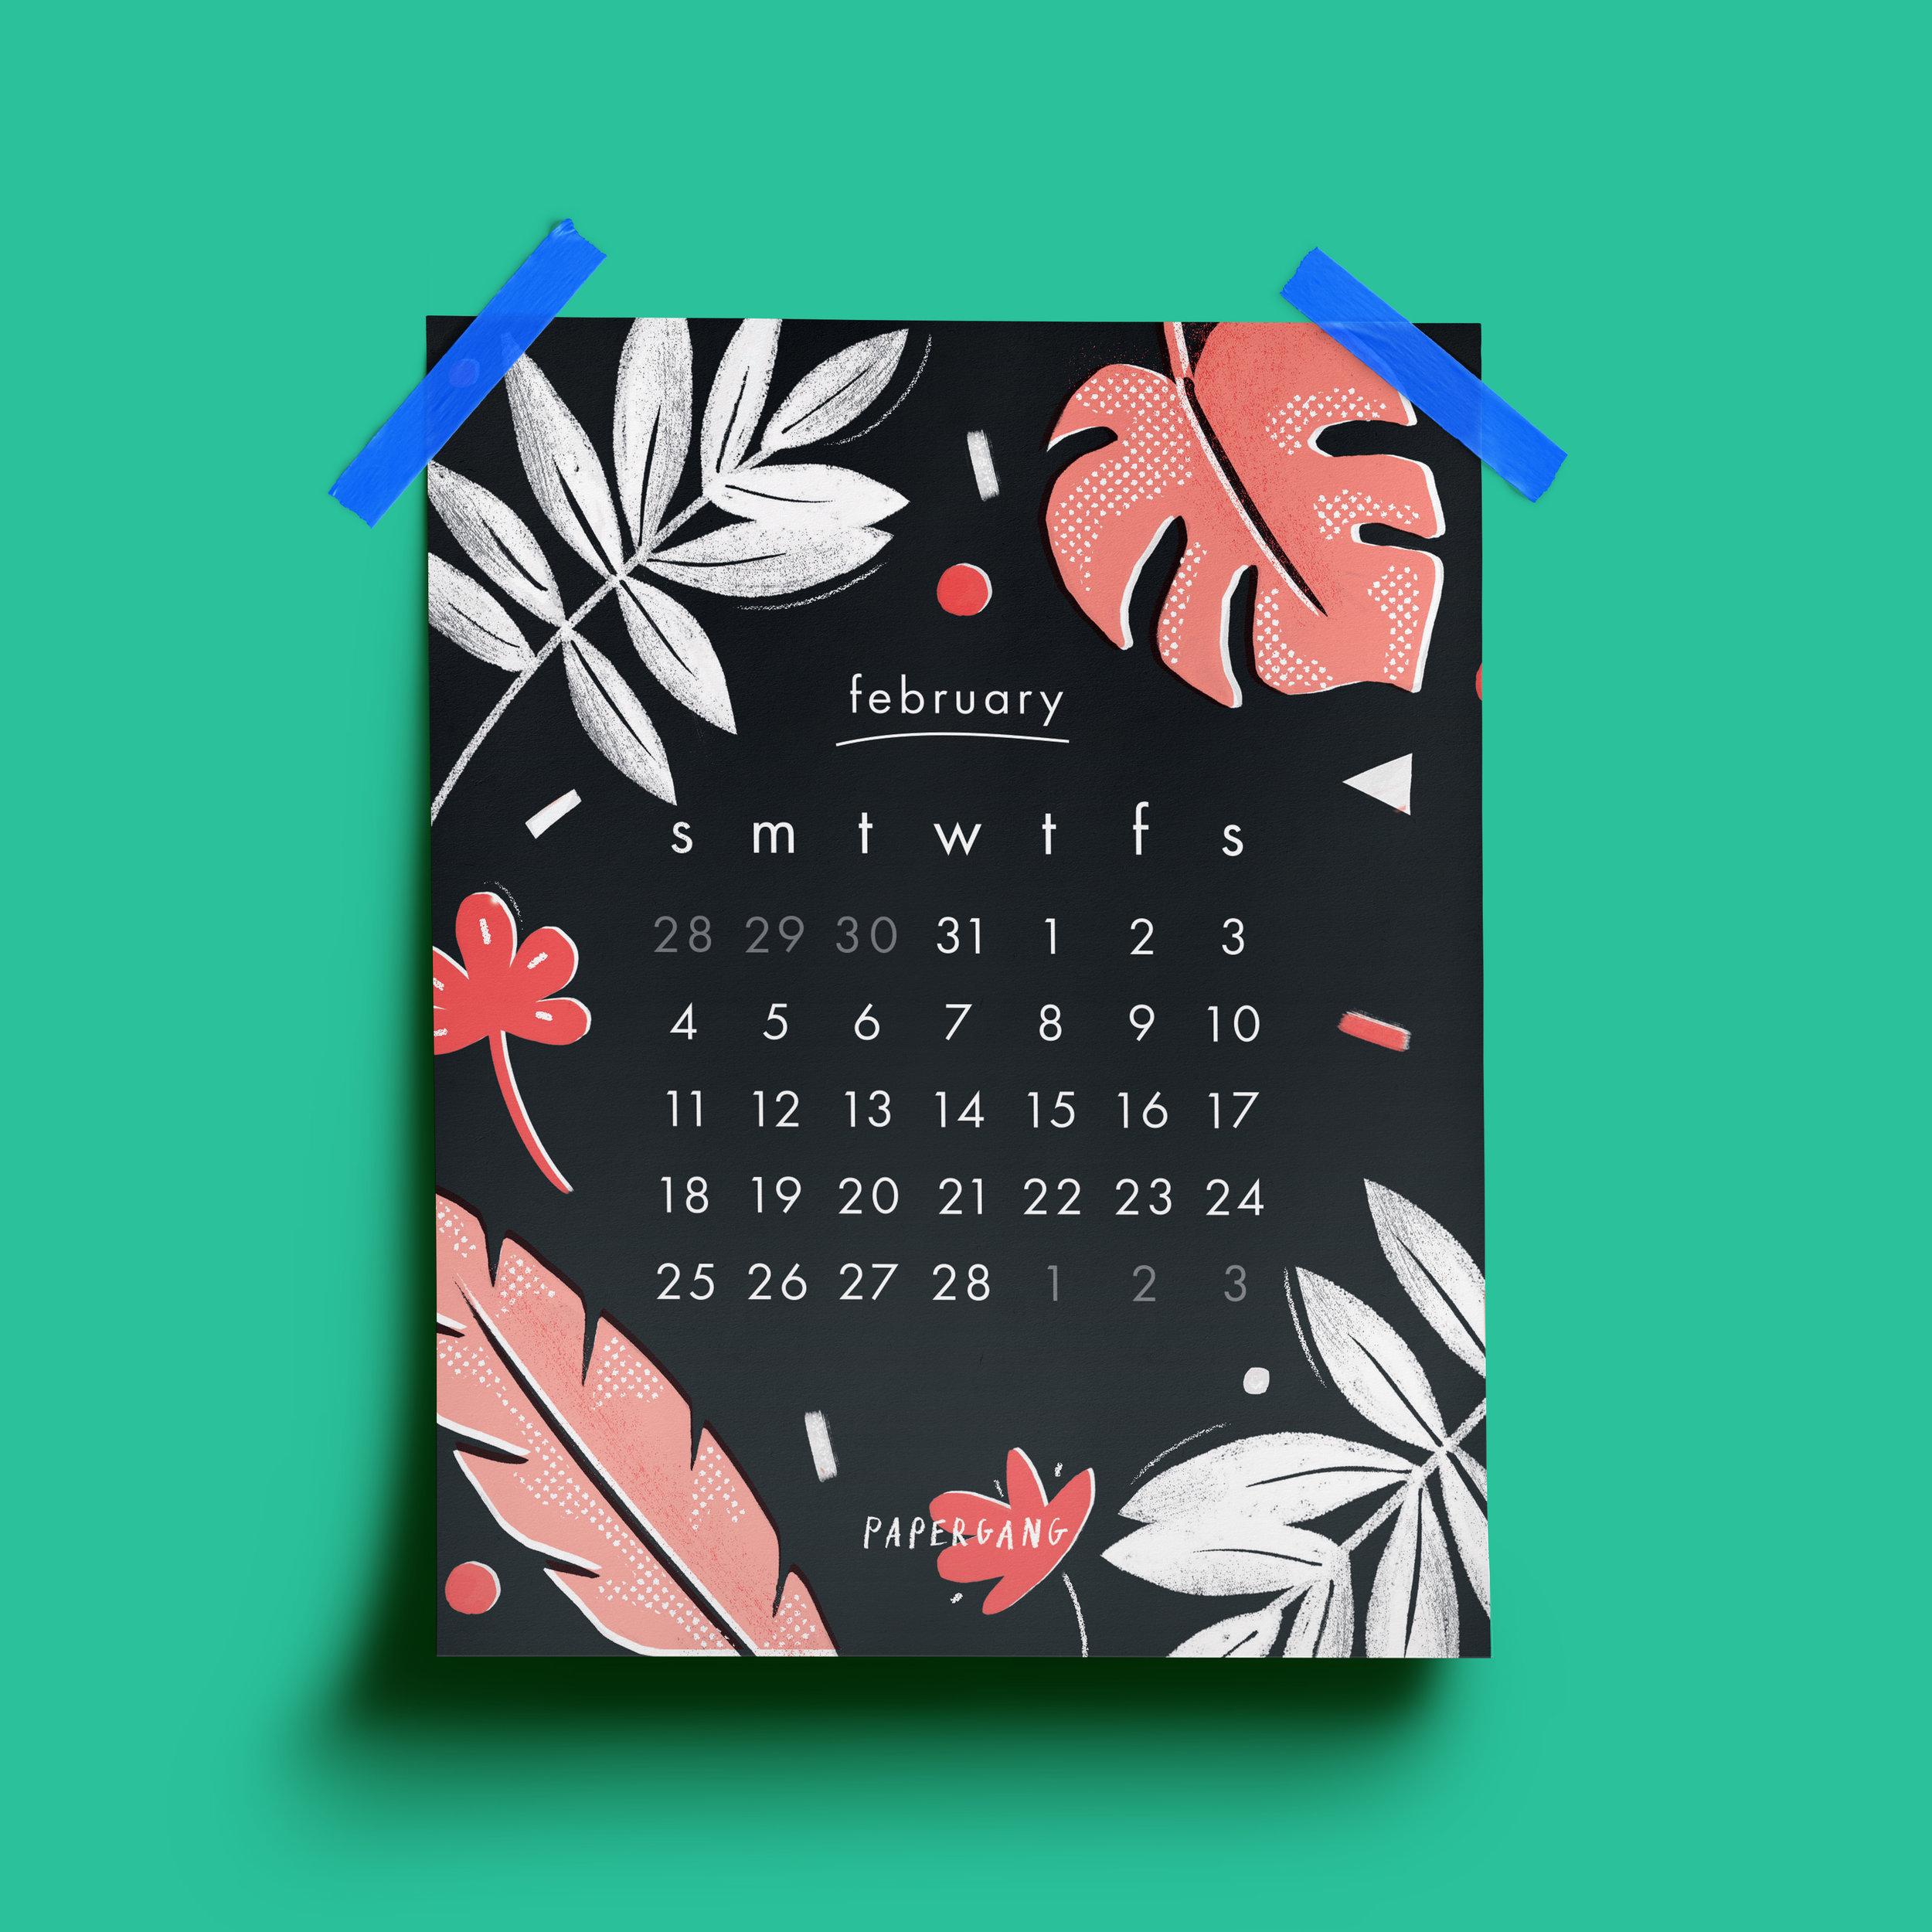 Papergang-Feb-2018-Calendar-Mock-Up.jpg